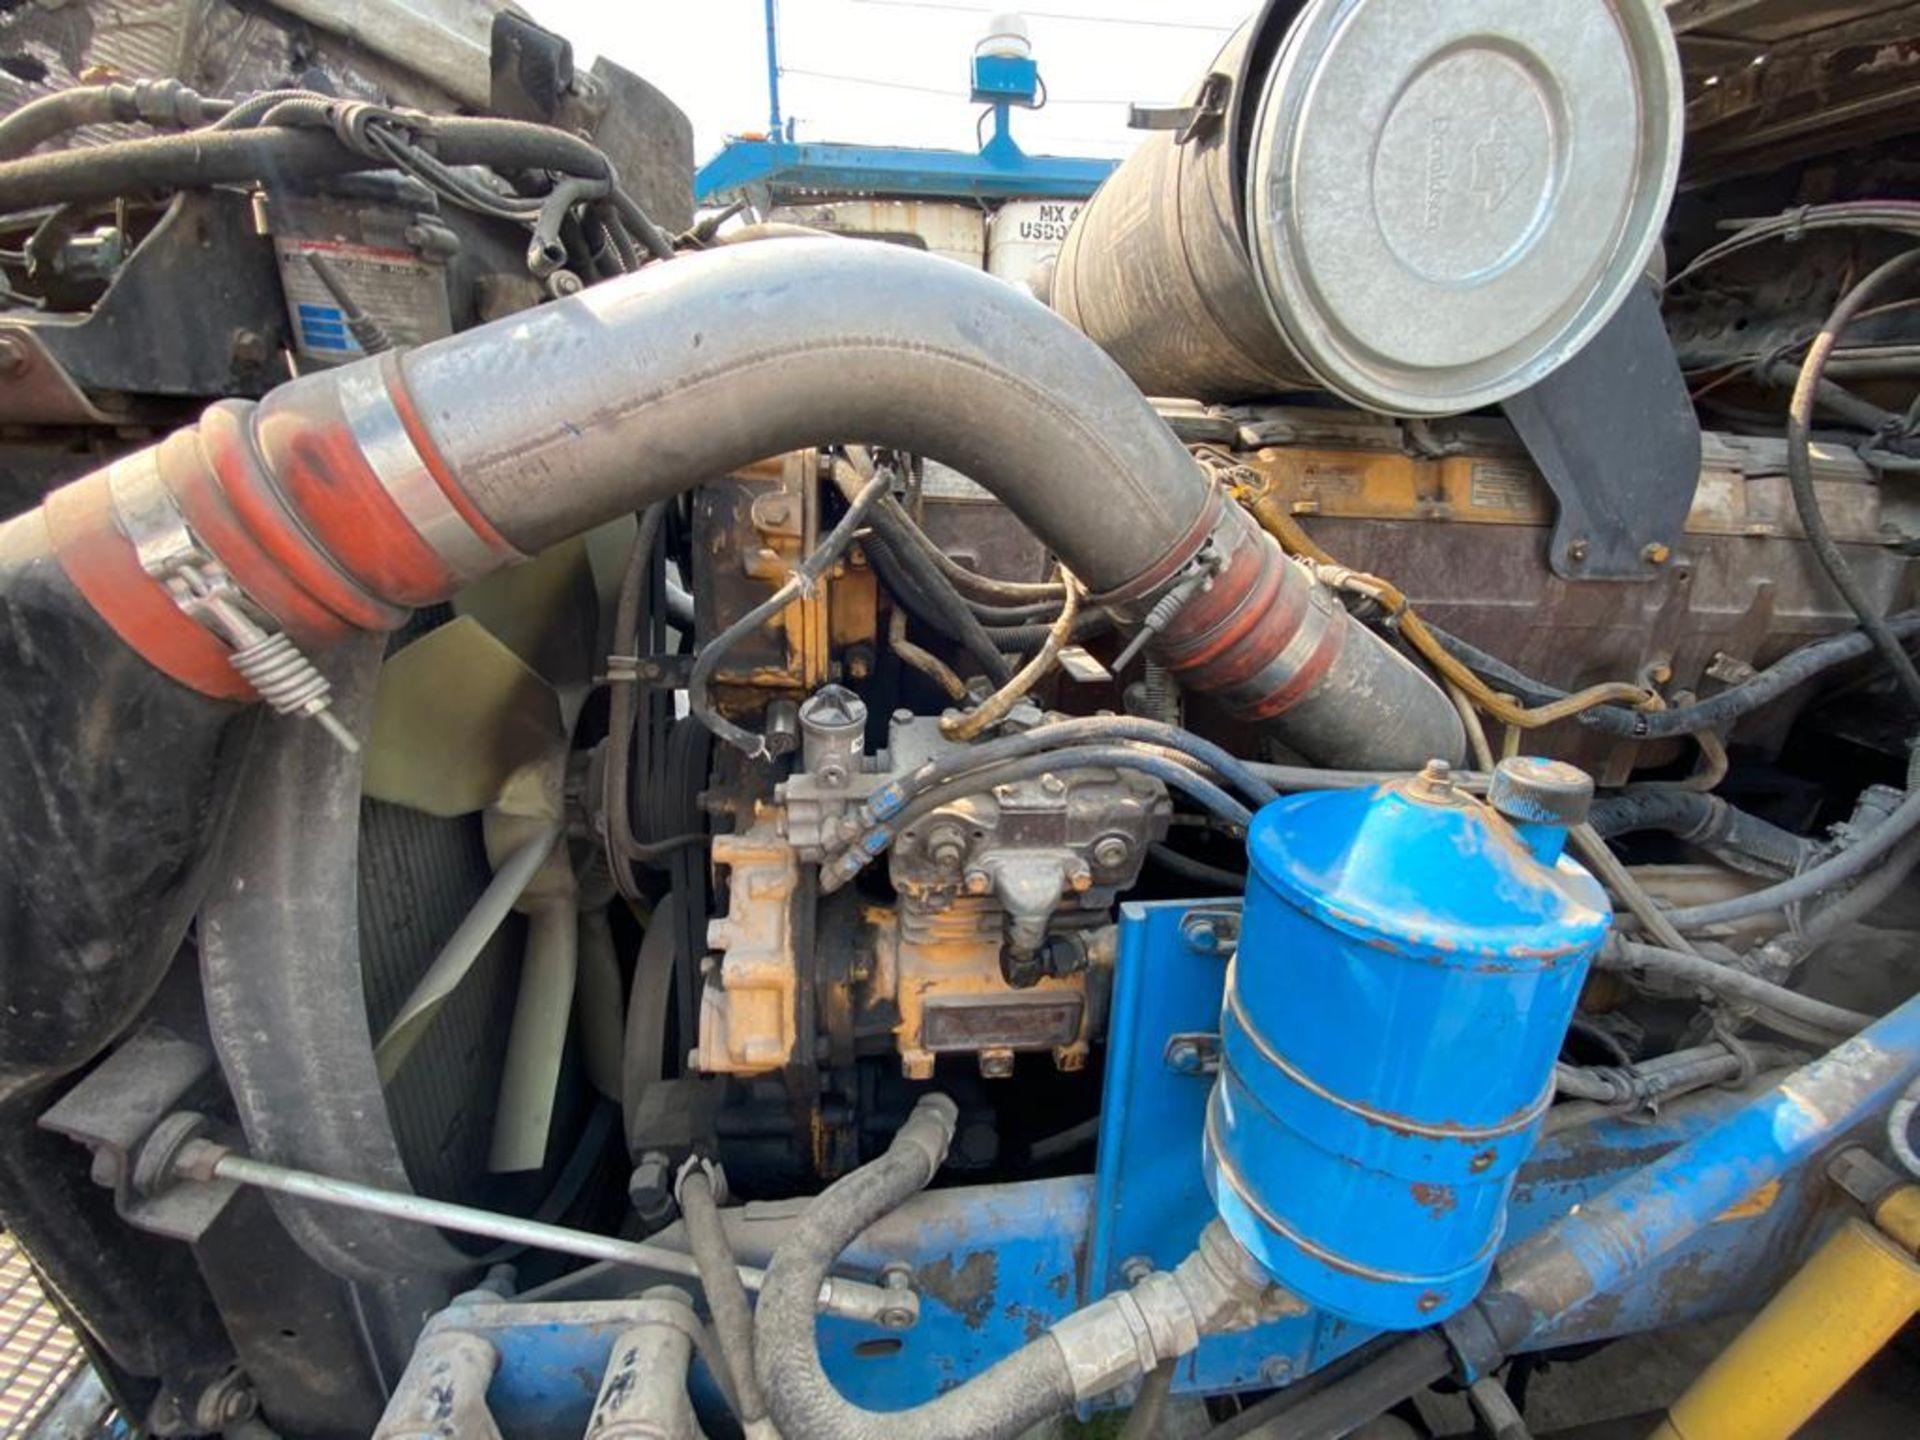 1999 Kenworth Sleeper truck tractor, standard transmission of 18 speeds - Image 71 of 72